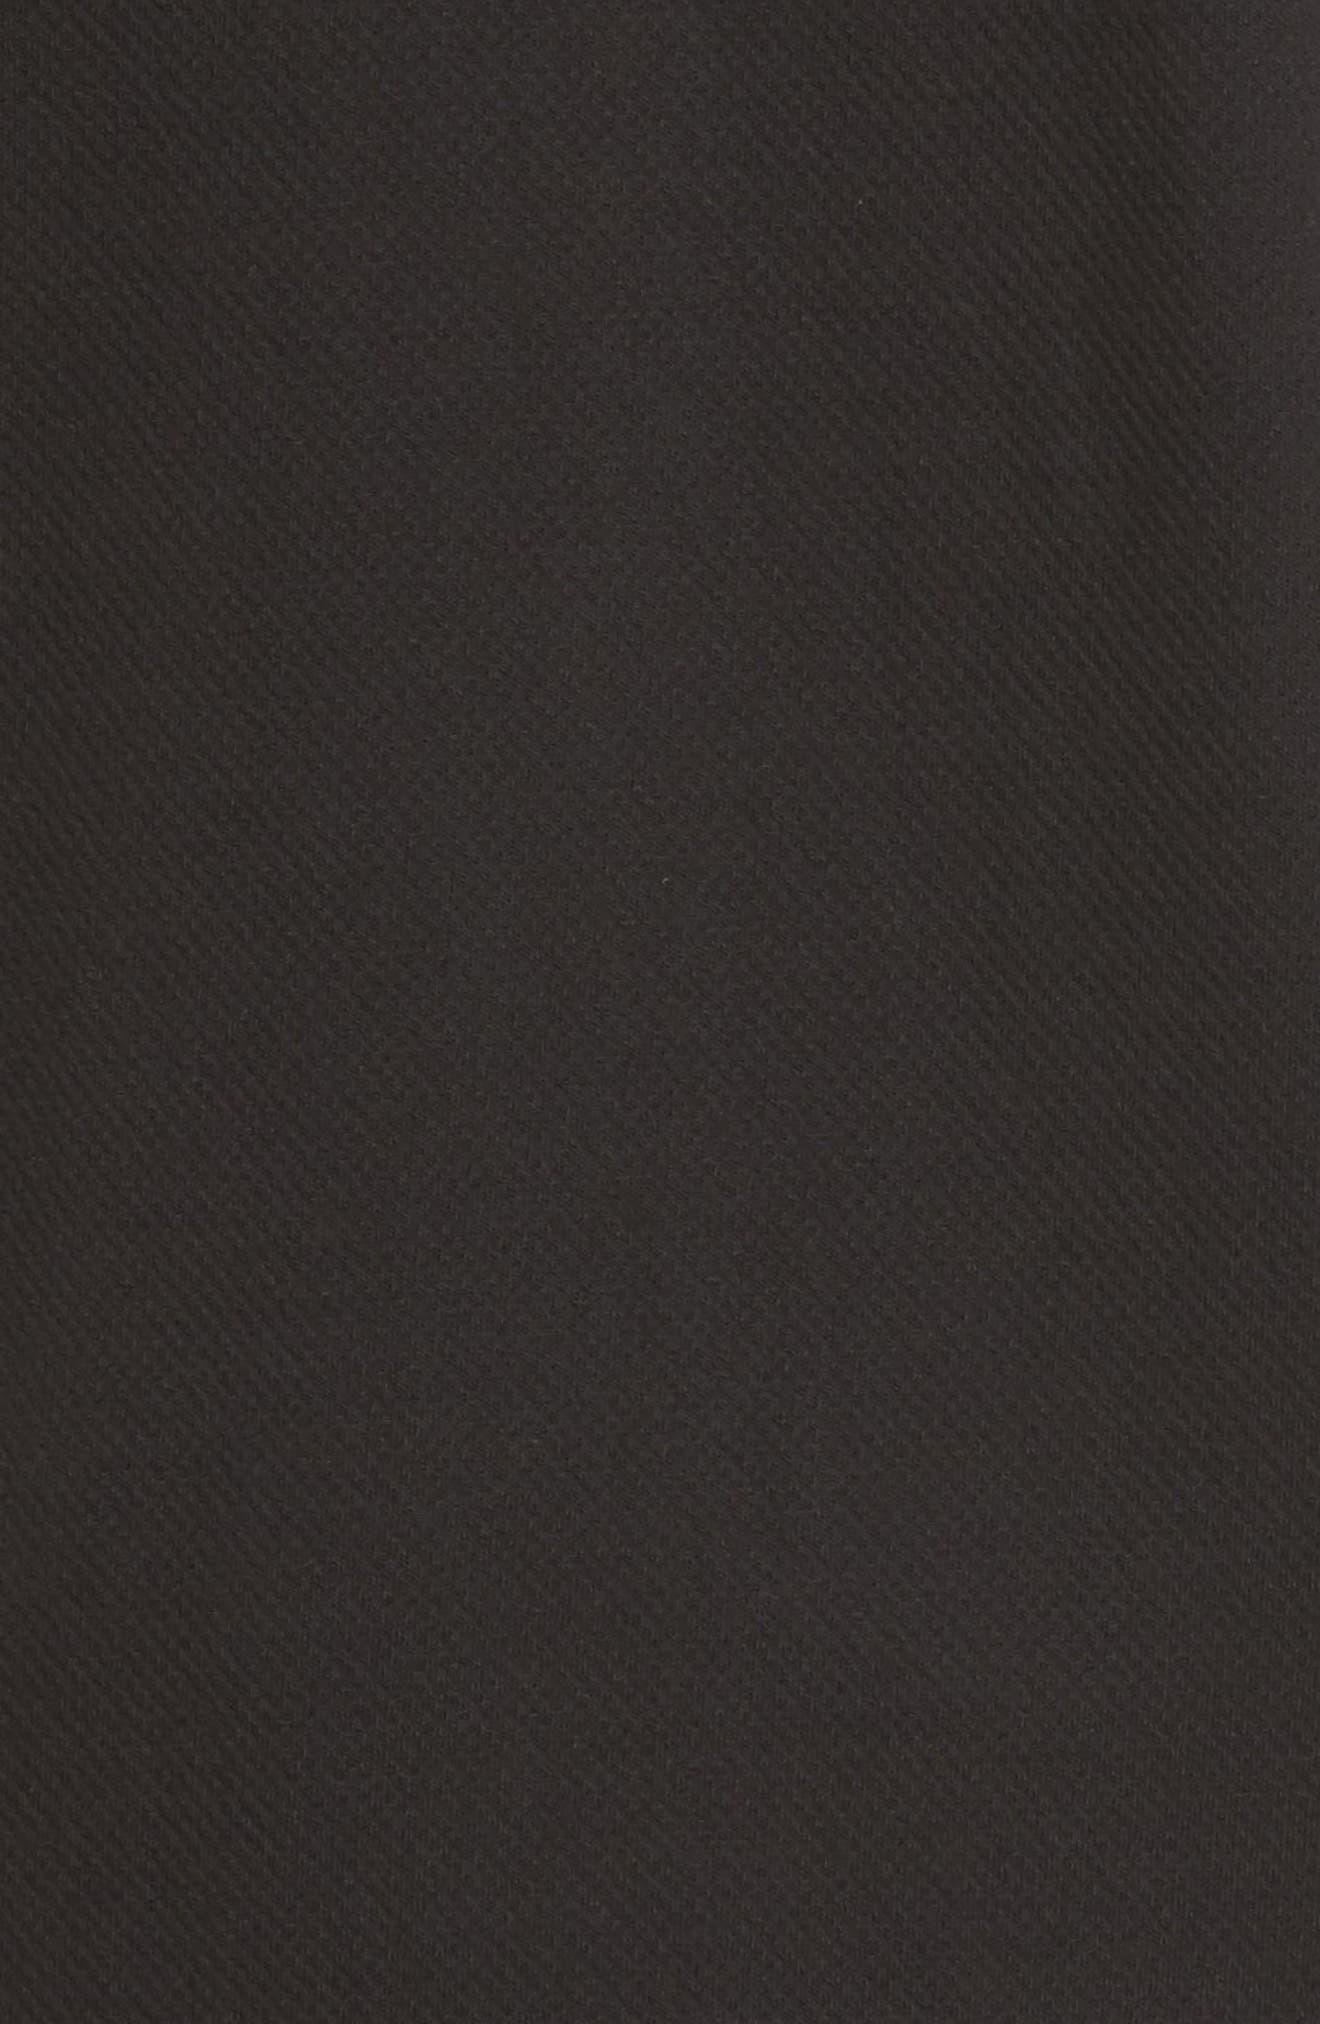 Zip Fleece Bomber Jacket,                             Alternate thumbnail 6, color,                             Black Caviar